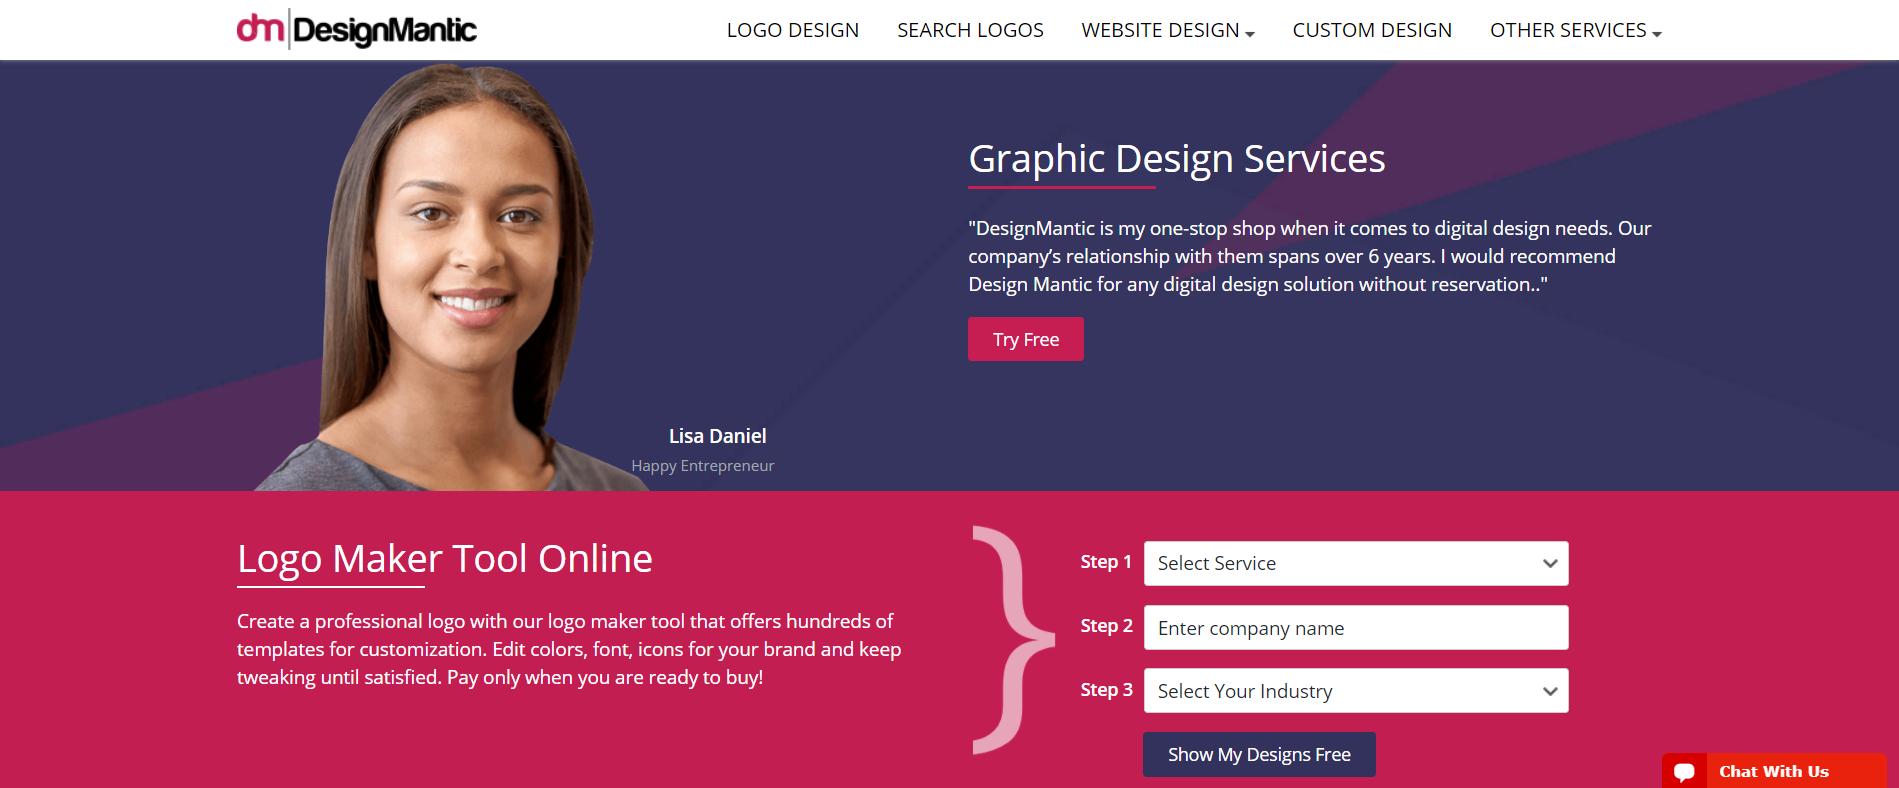 DesignMantic-Overview